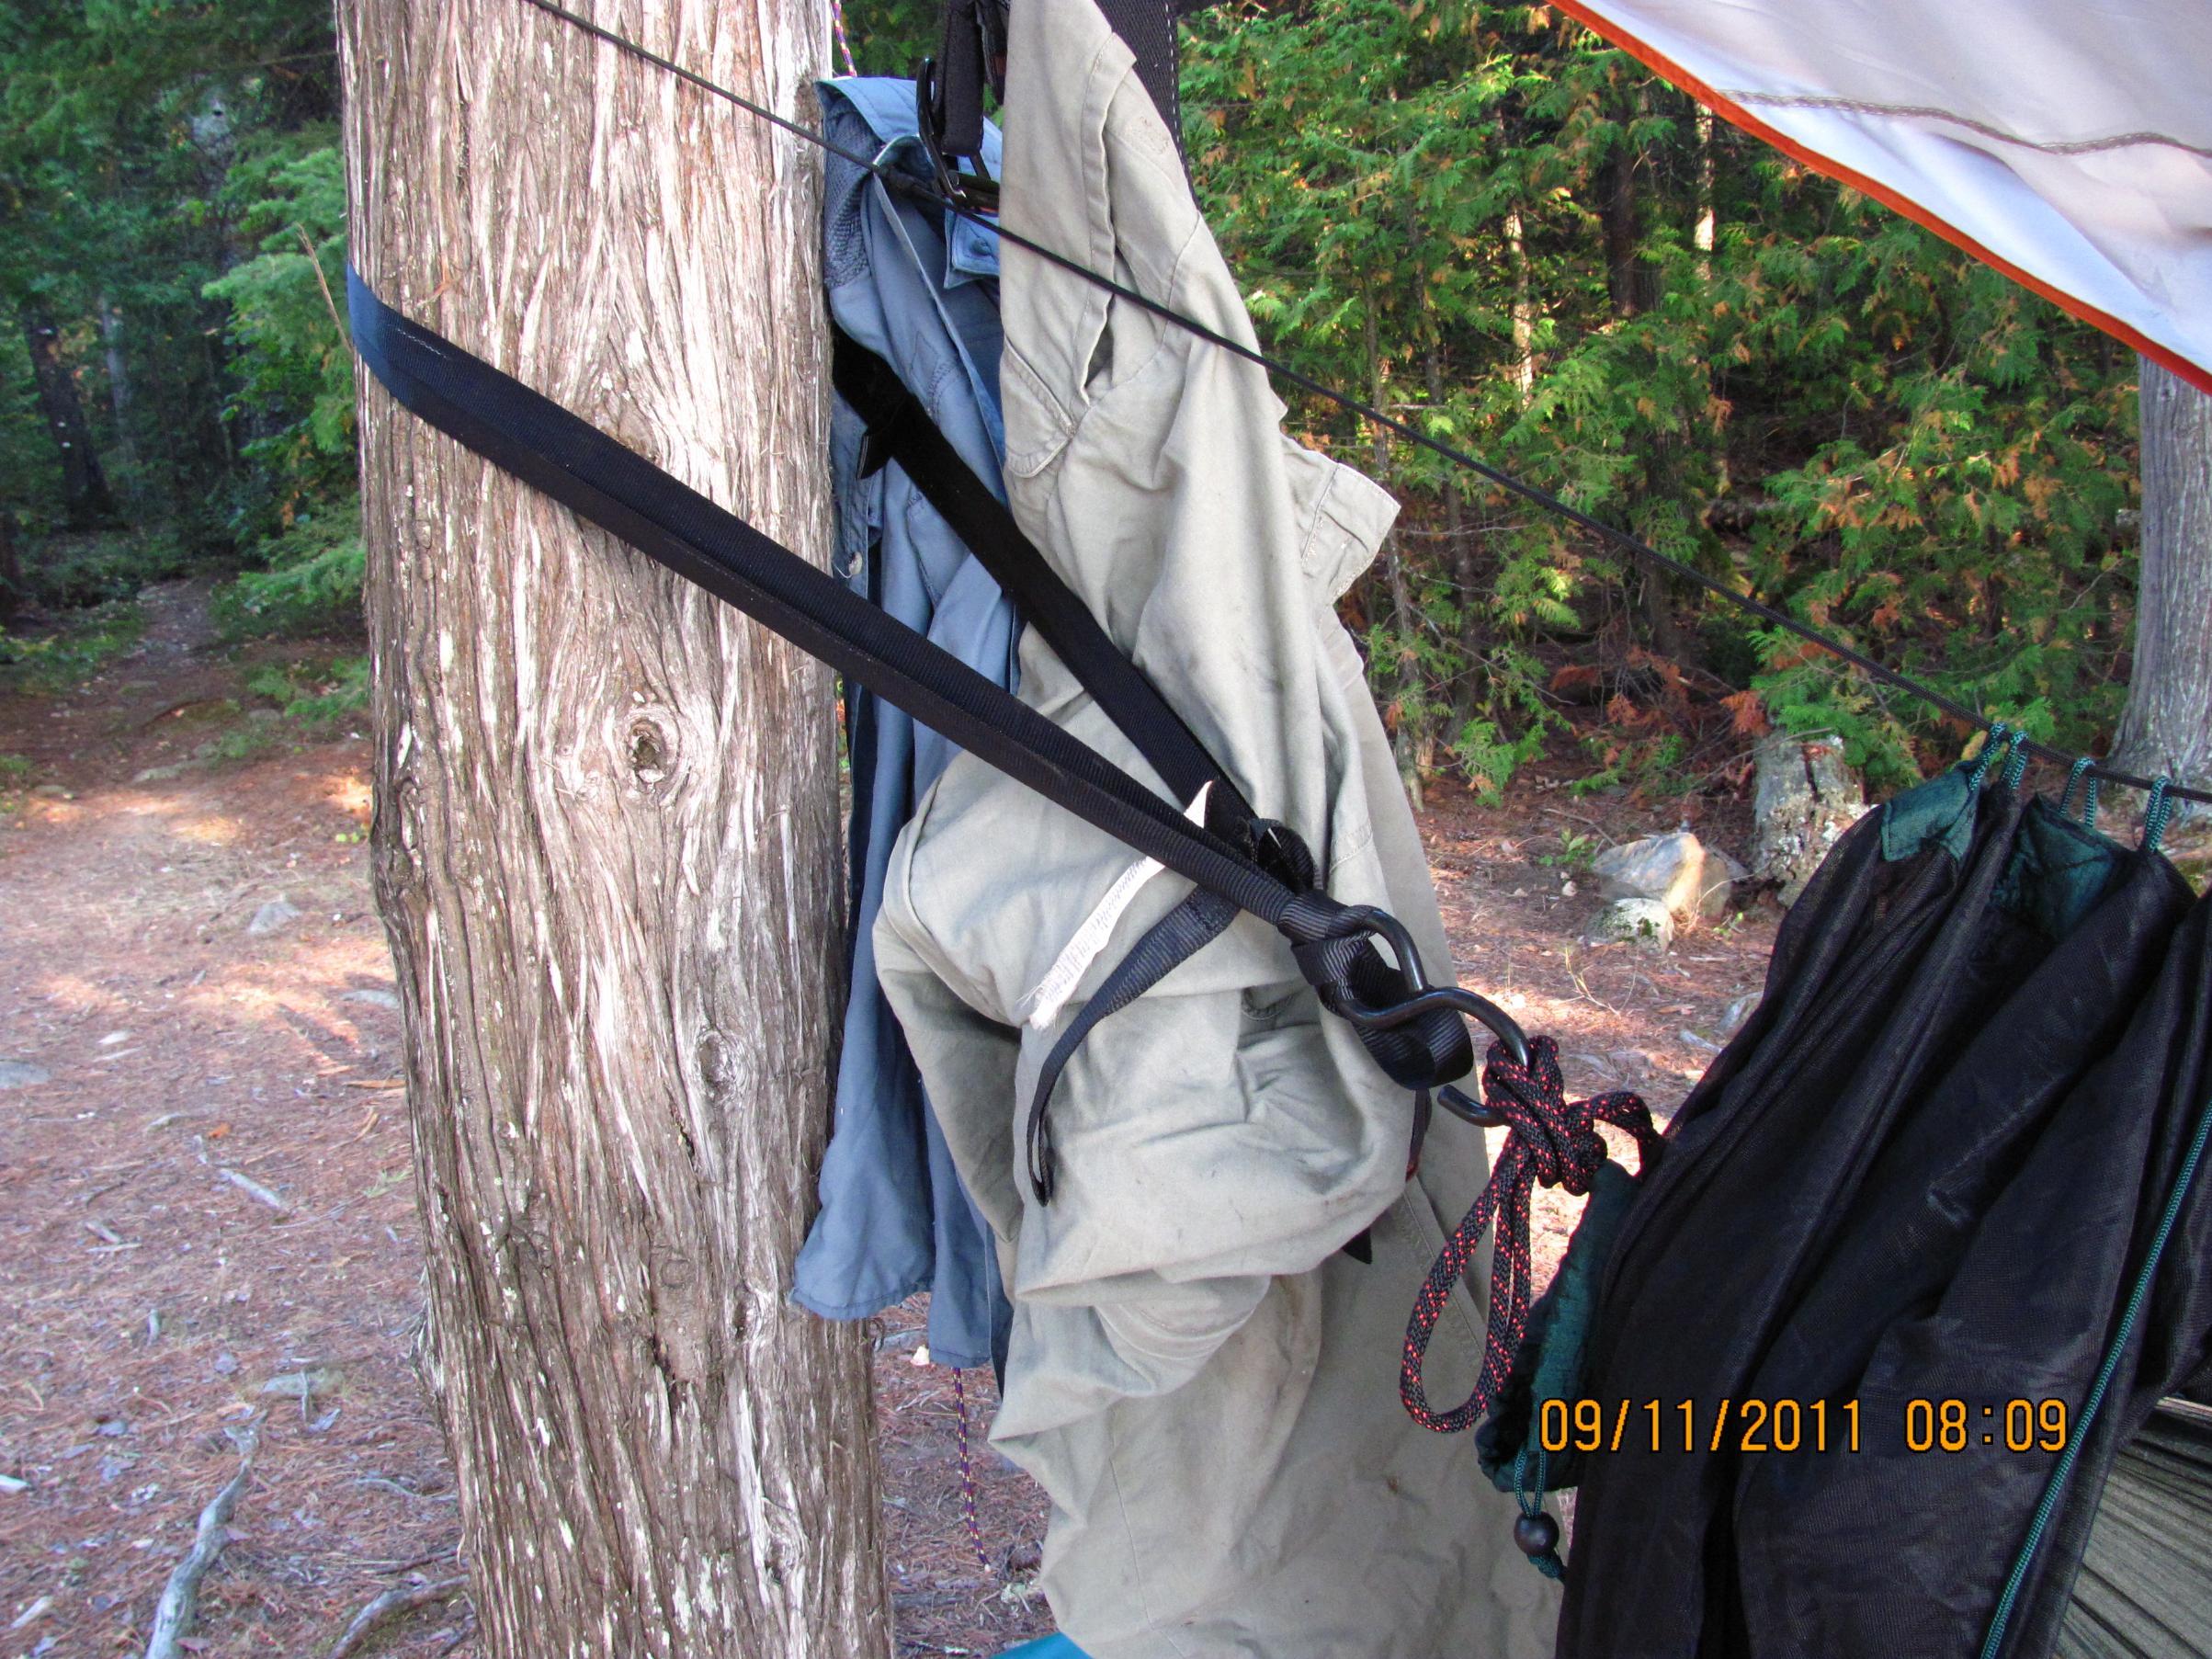 outdoor reviews hammocks vivere cotton pdx hammock stand hangers wayfair with